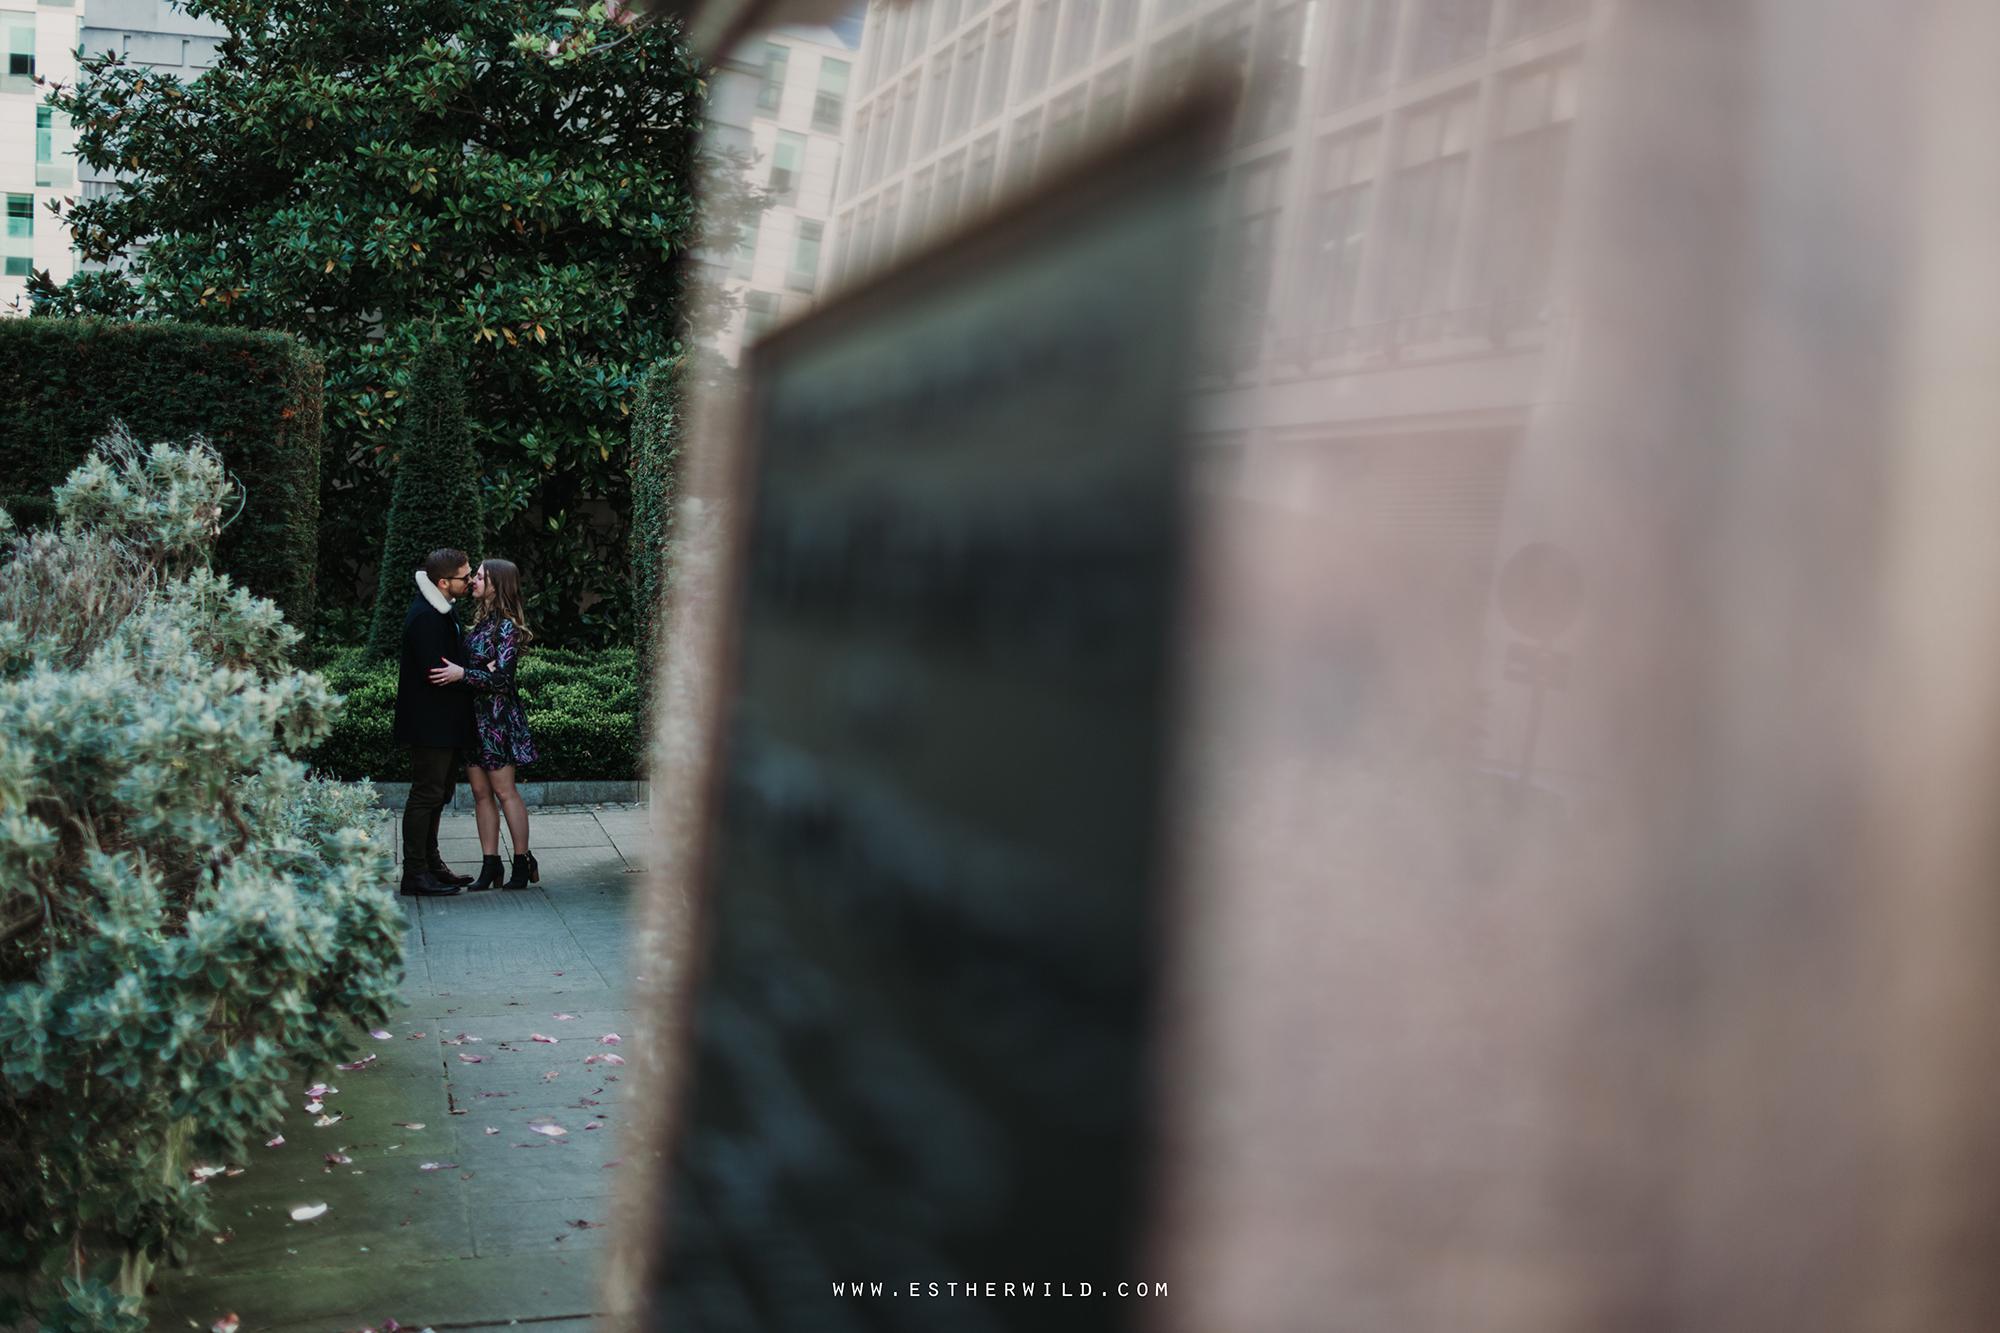 London_Engagement_Session_Pre-Wedding_Photo_Shoot_Esther_Wild_Photographer_IMG_1223_Z72A0351.jpg